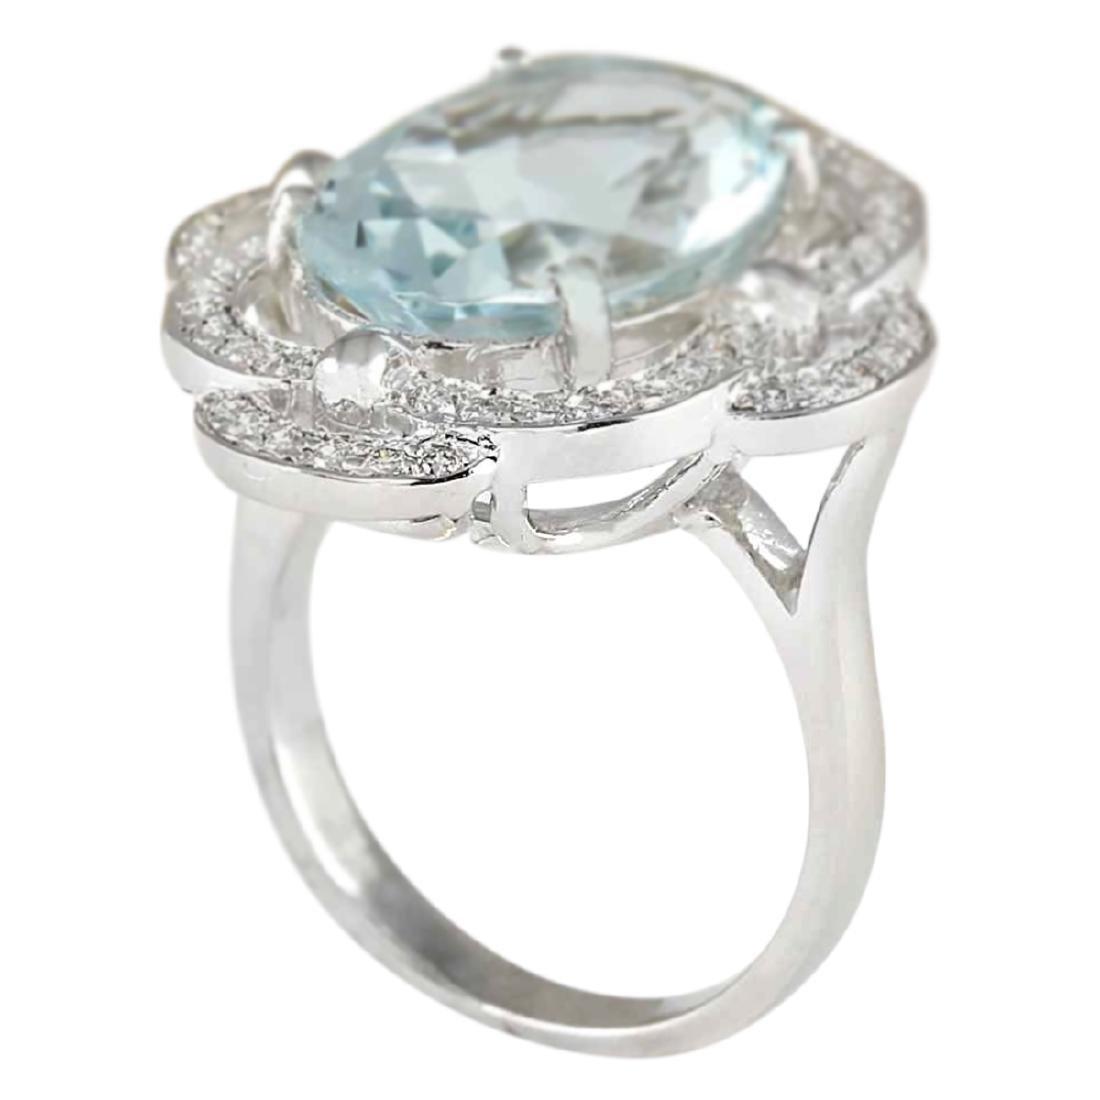 6.97 CTW Natural Aquamarine And Diamond Ring In 18K - 3